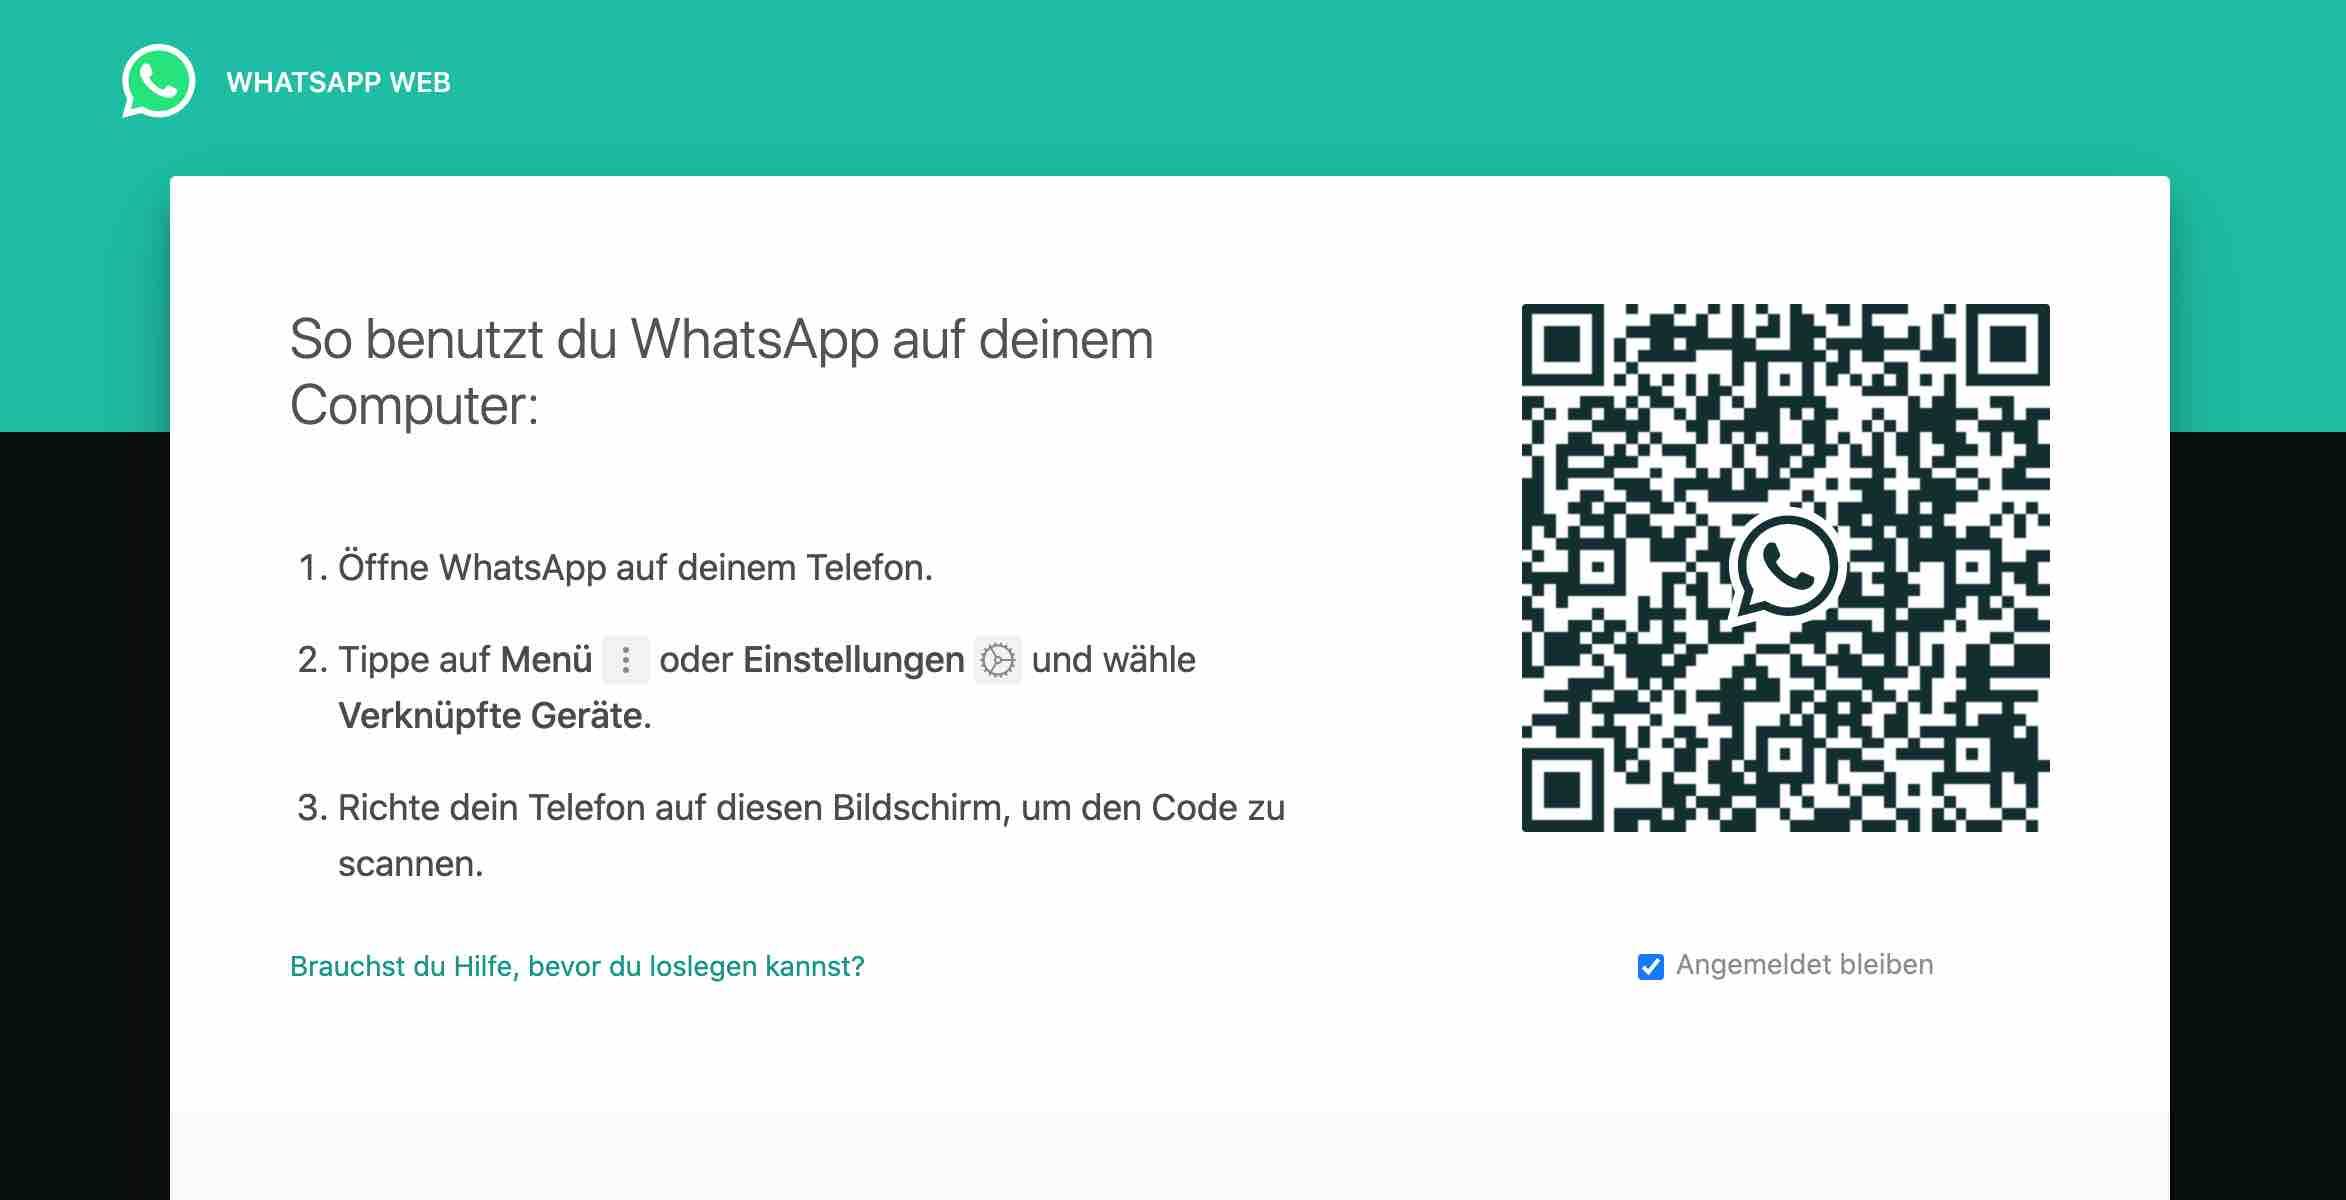 whatsapp-web-ohne-handy